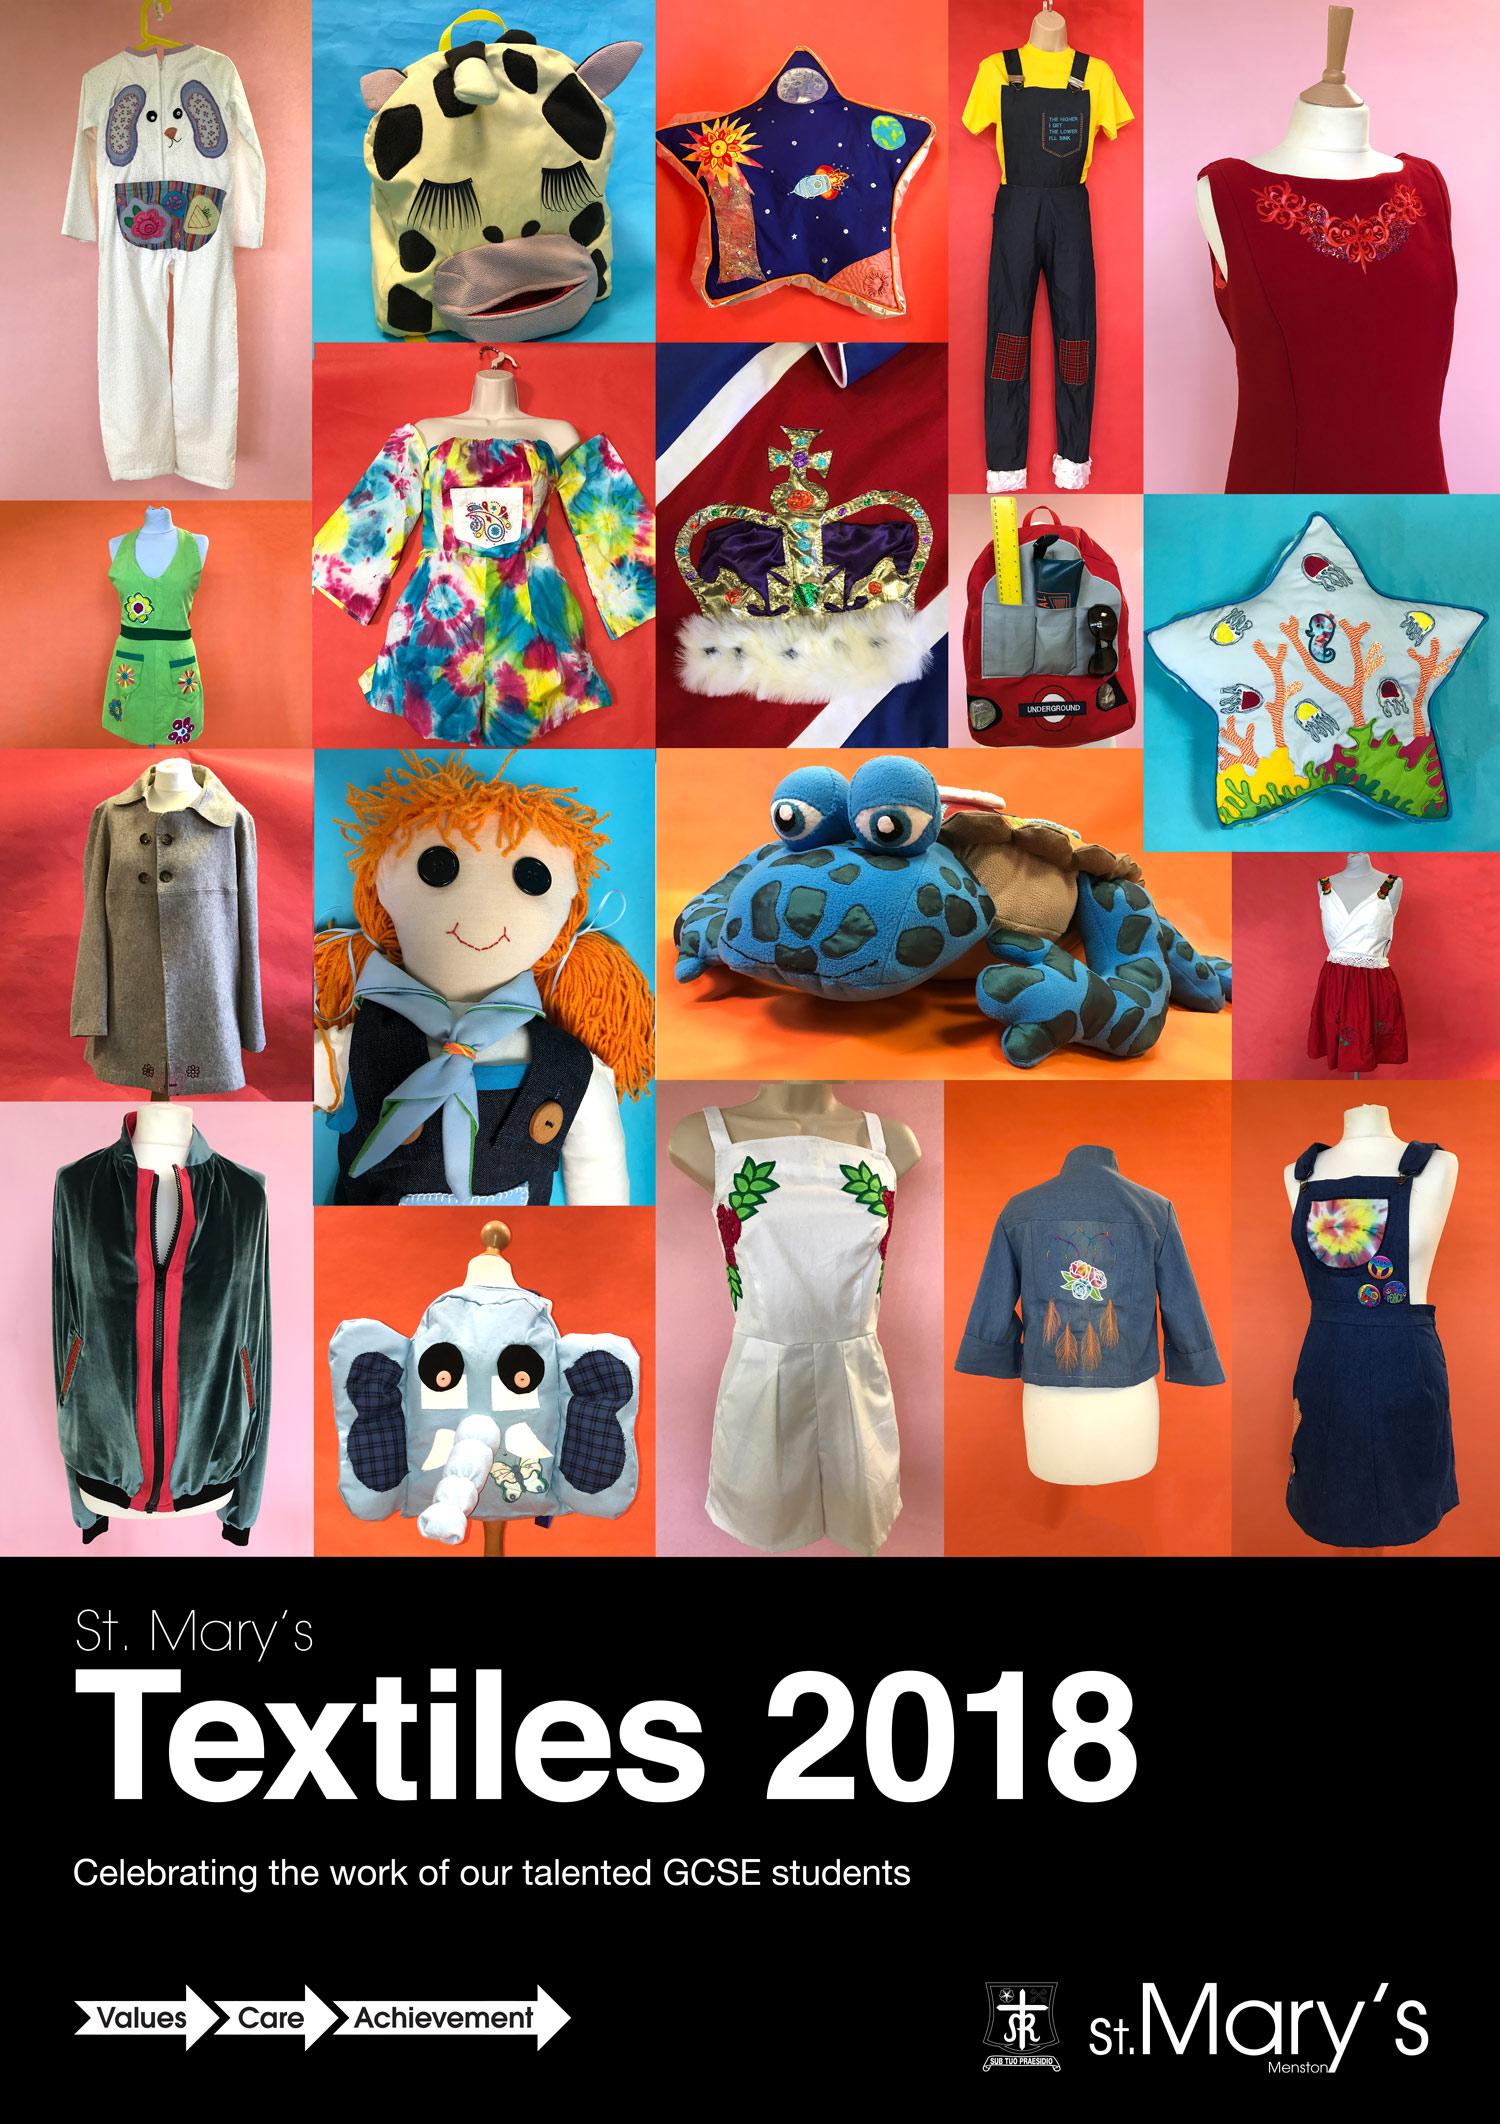 A1-textiles-2018-work-in-progress-2.jpg